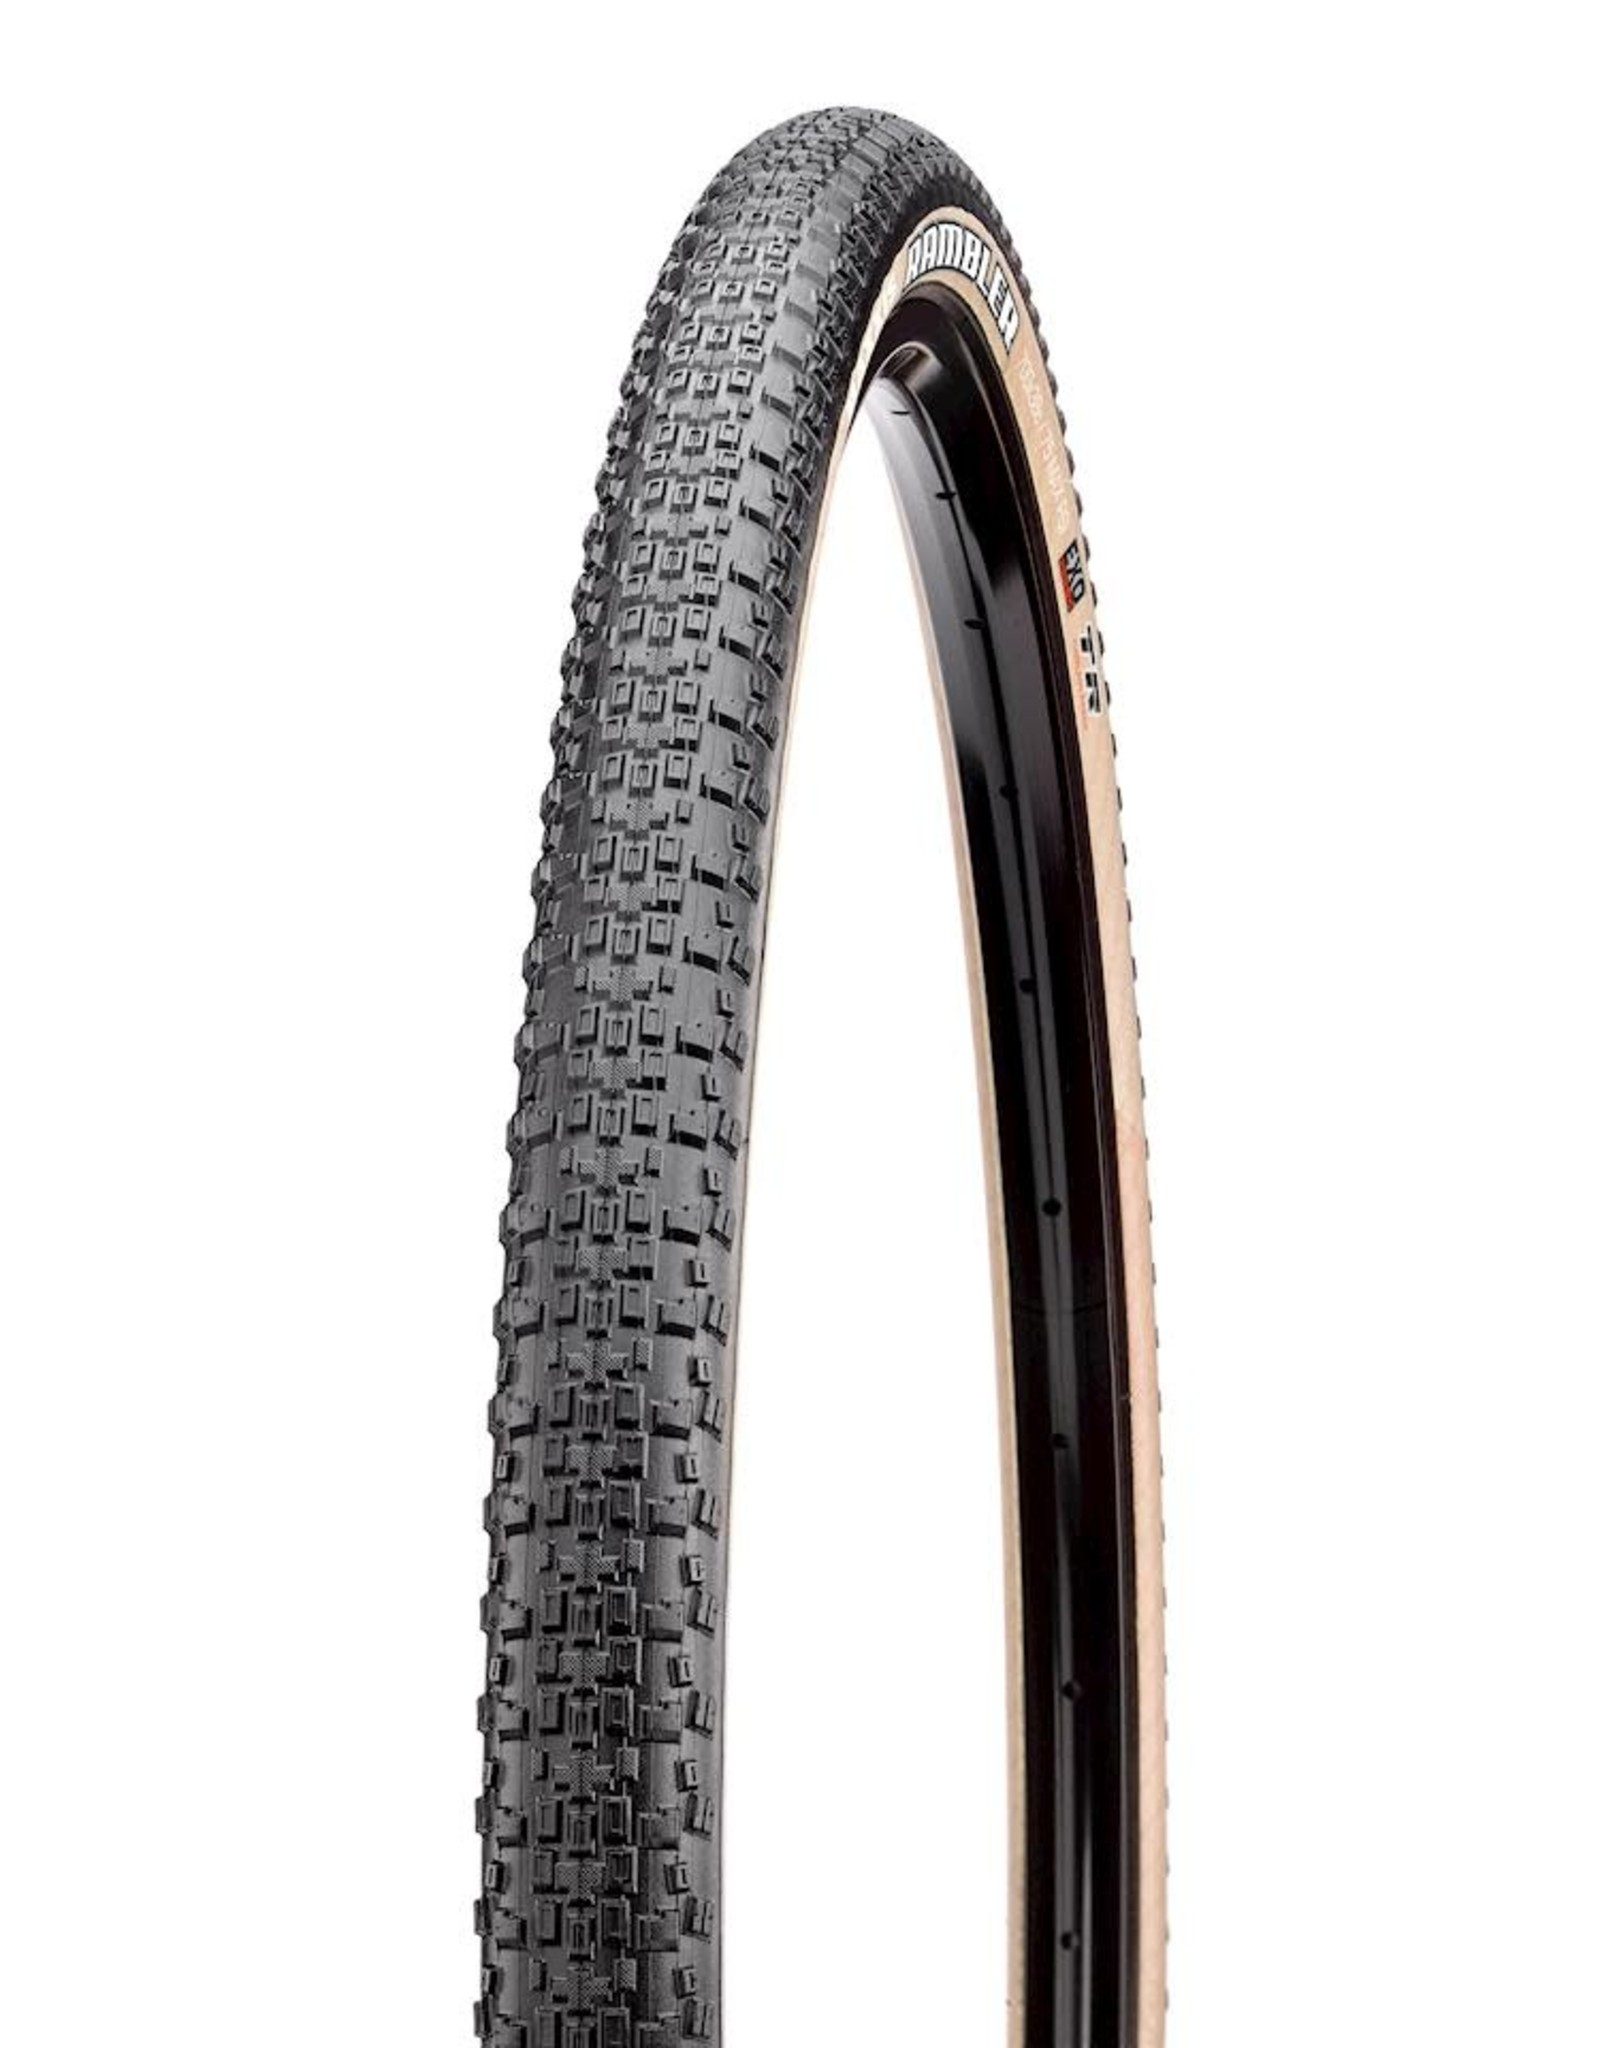 Maxxis Maxxis Rambler Tire - 700 x 38, Tubeless, Folding, Black/Tan, Dual, EXO